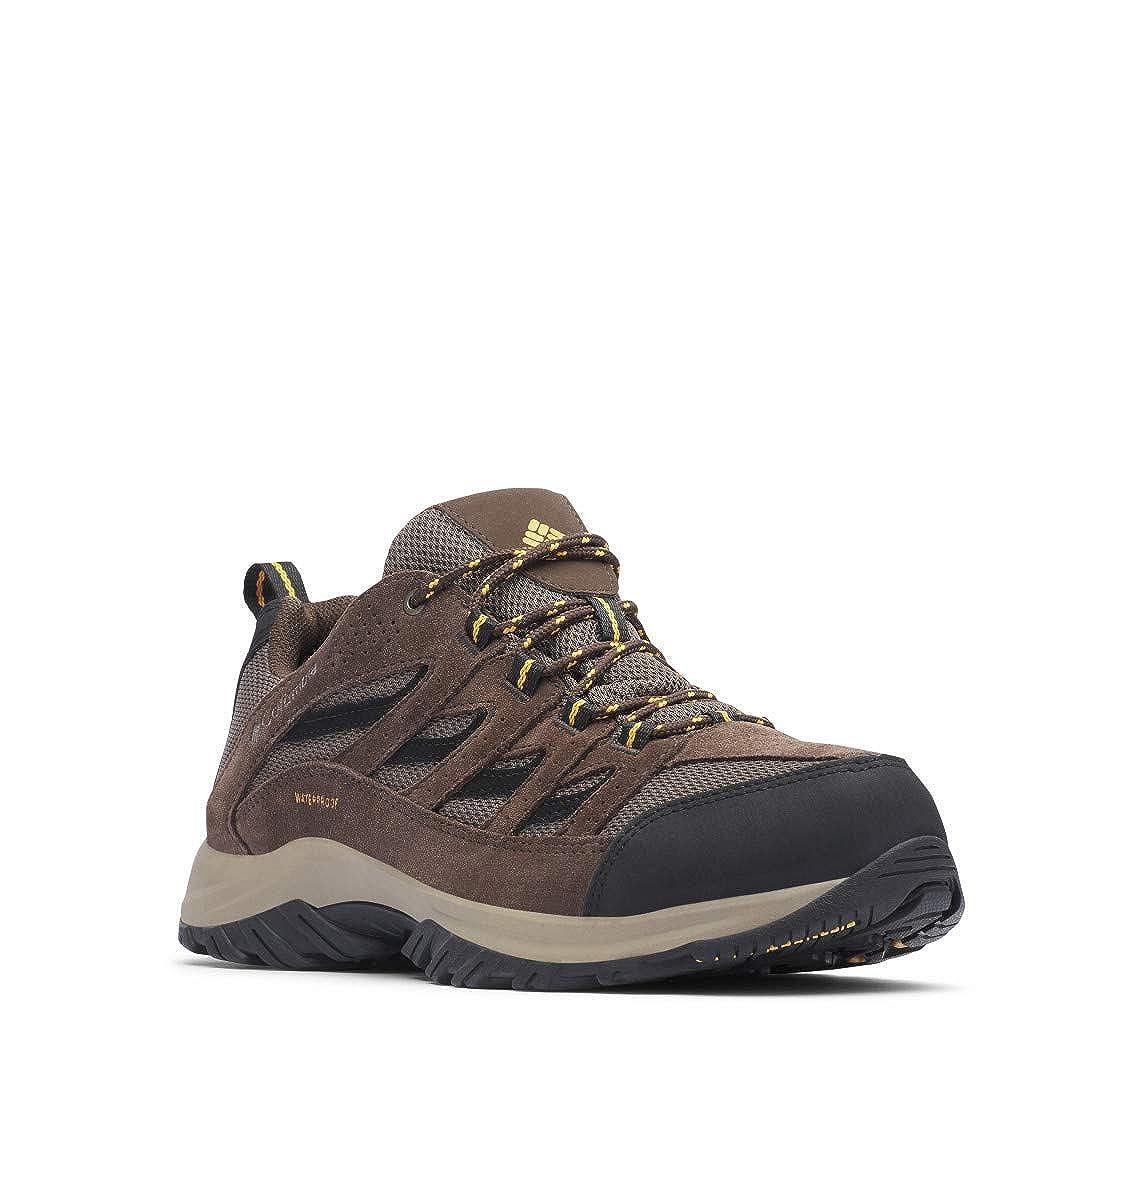 Mud, Squash Columbia Femmes Crestwood Chaussures Athlétiques 51 EU